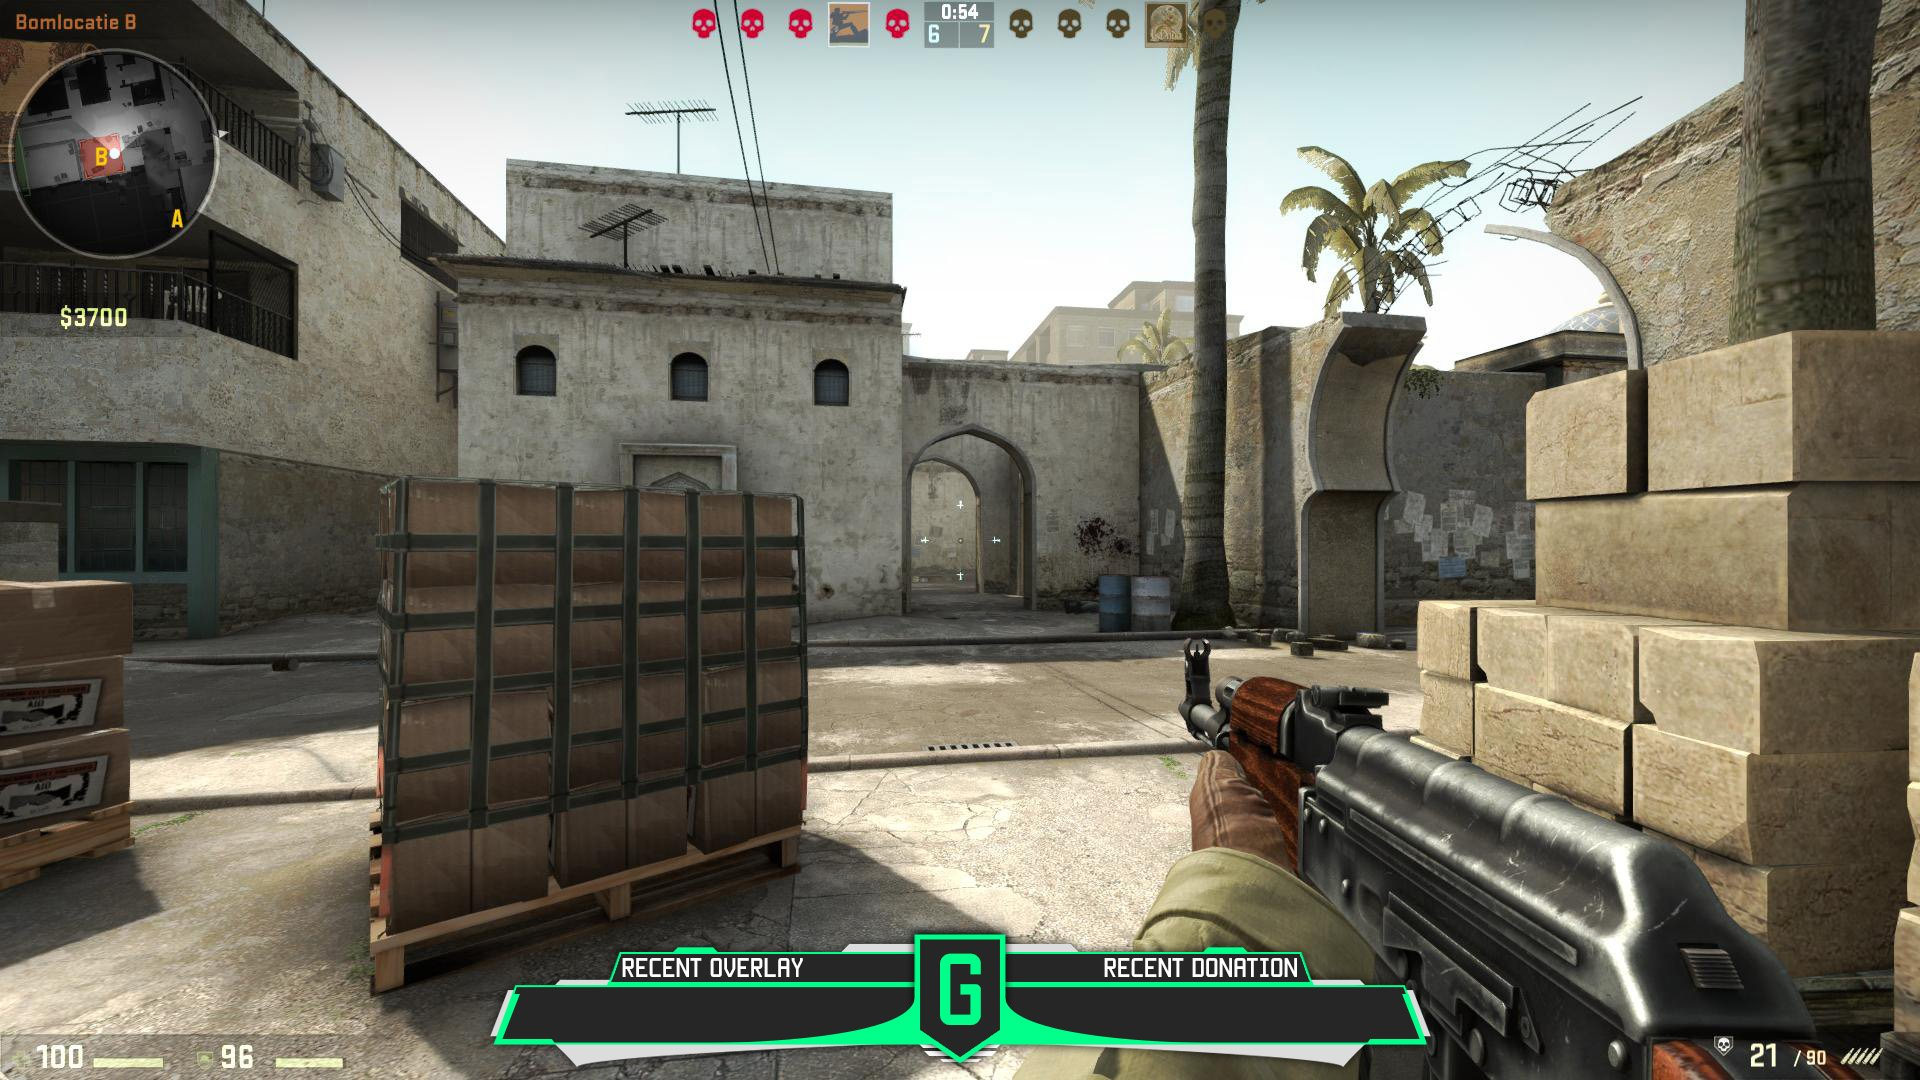 Counter strike global offensive увеличить fps переделать аватарку для кс го 64х64